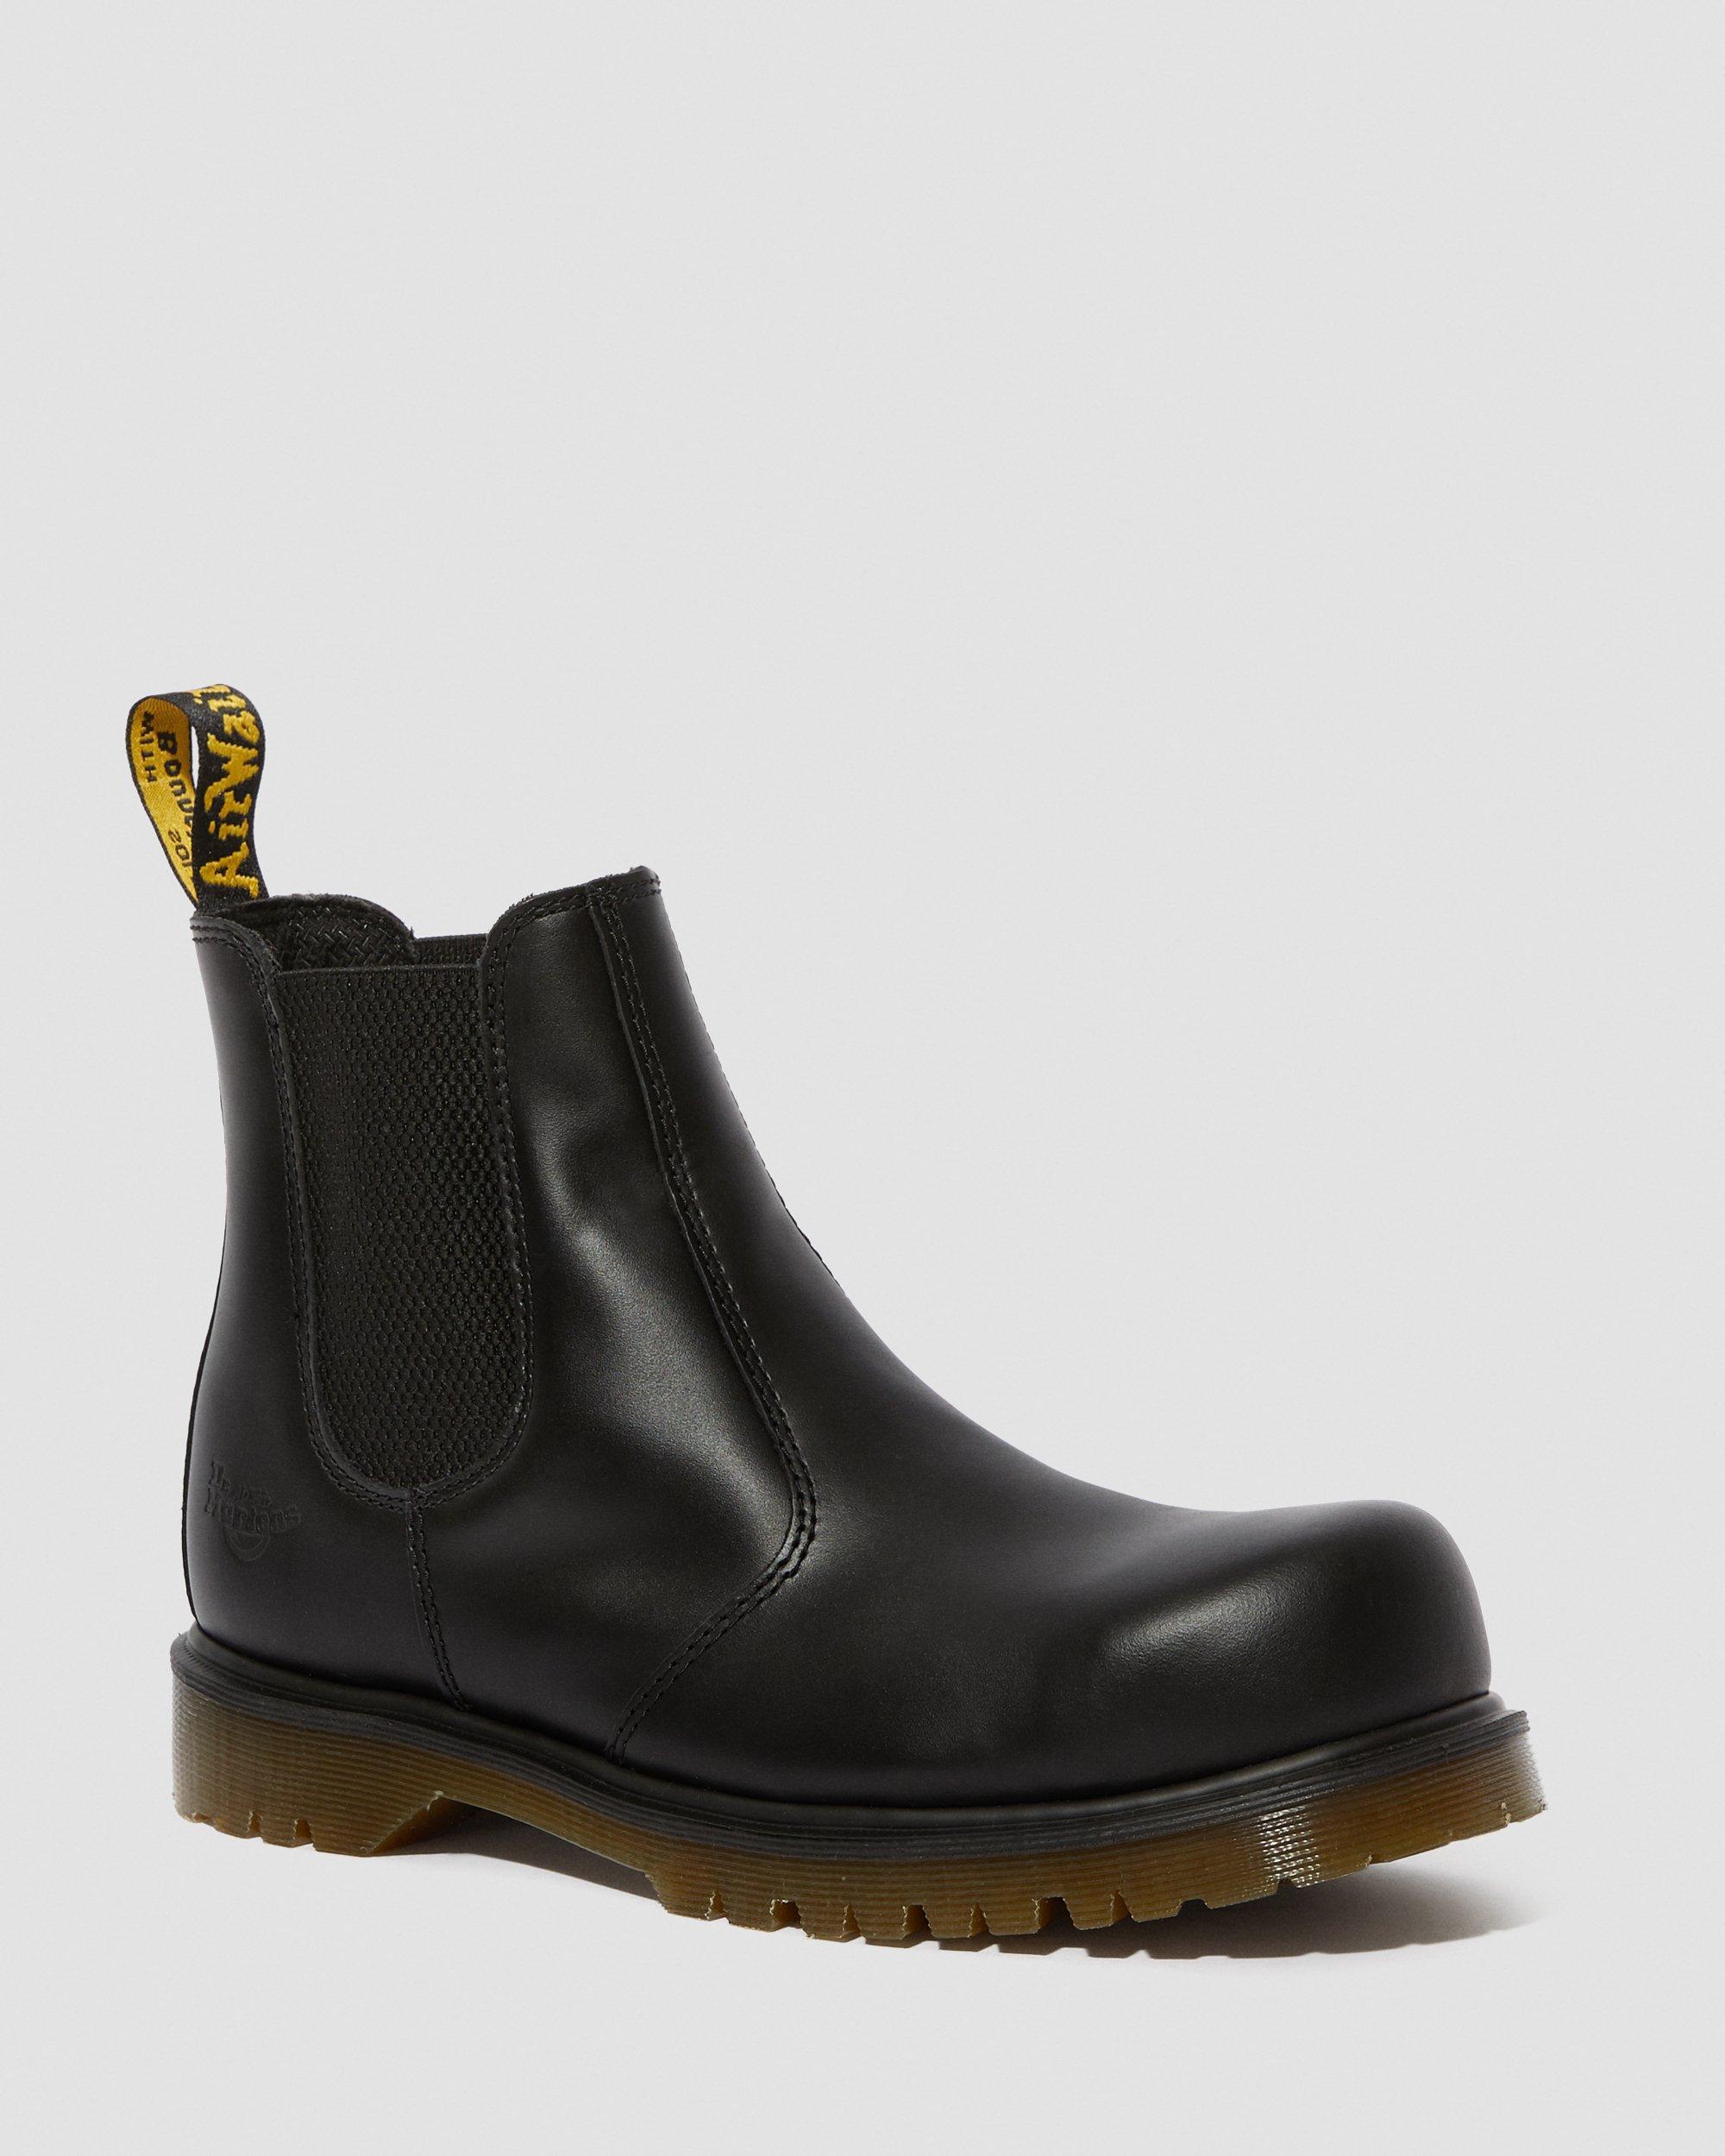 Dr Martens Icon 2228 Safety Dealer Boots Black Size 10